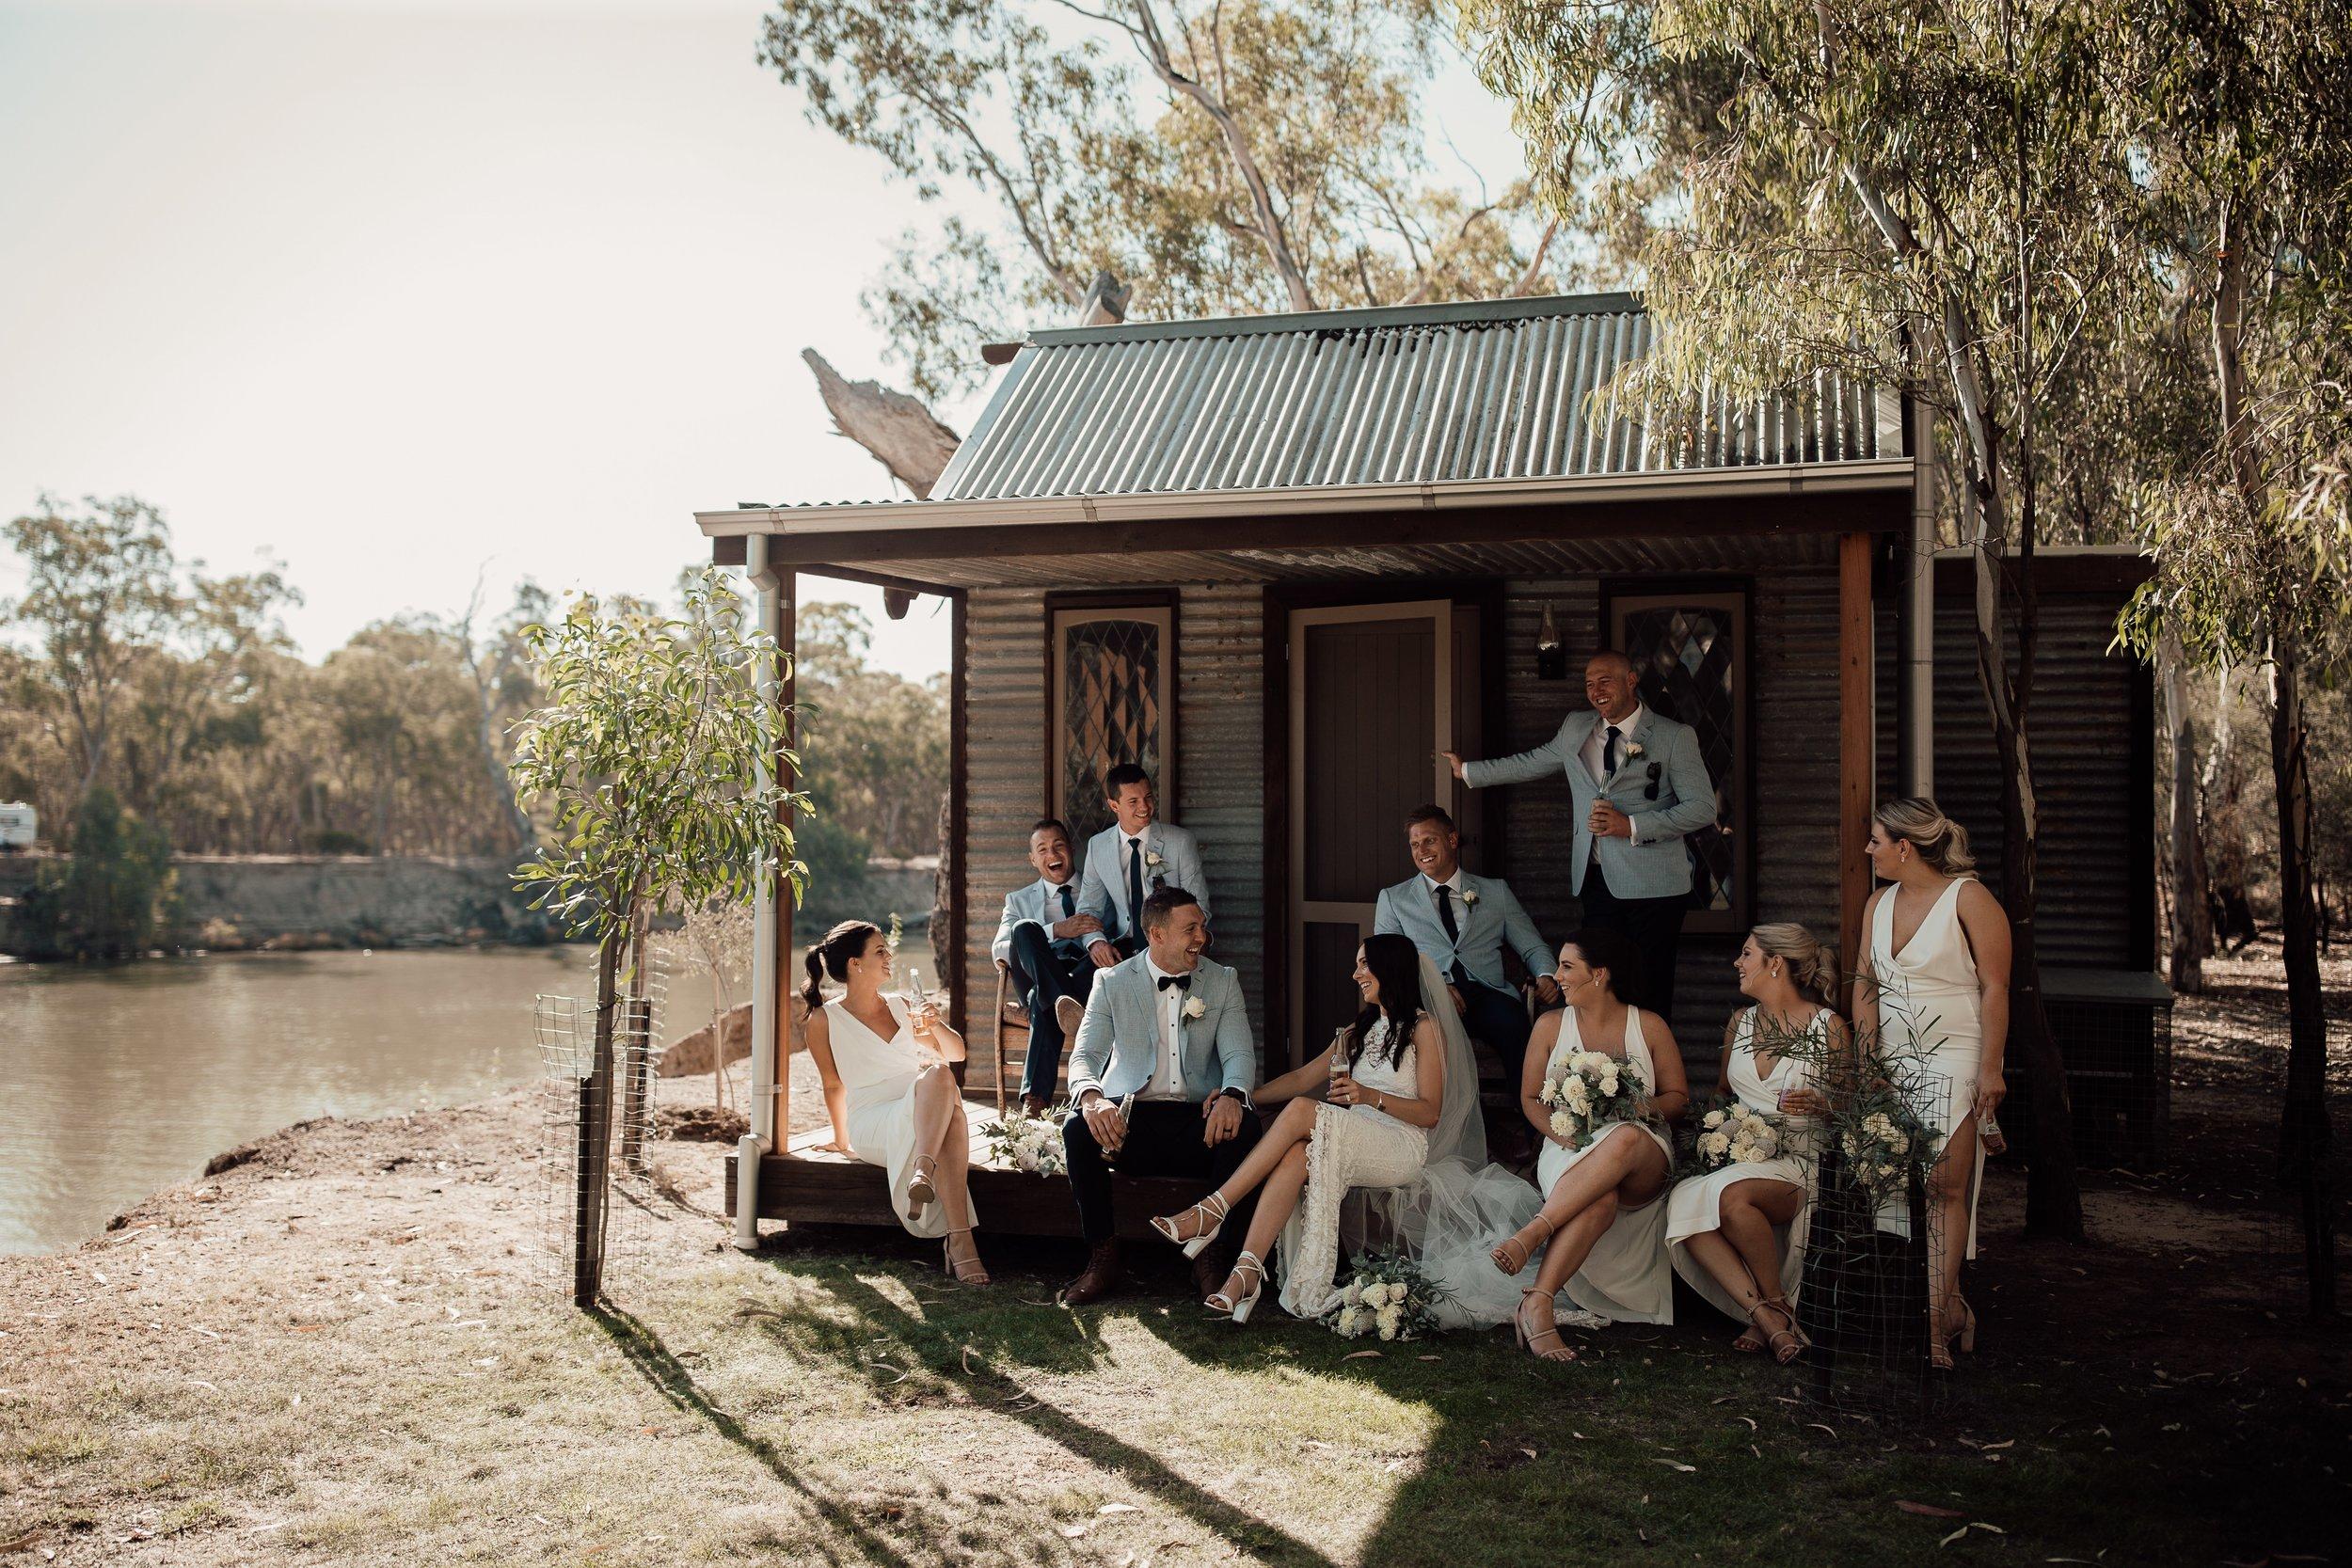 mickalathomas_puremacphotography_weddingphotographer_couplephotographer_Sheppartonphotographer_1477.jpg